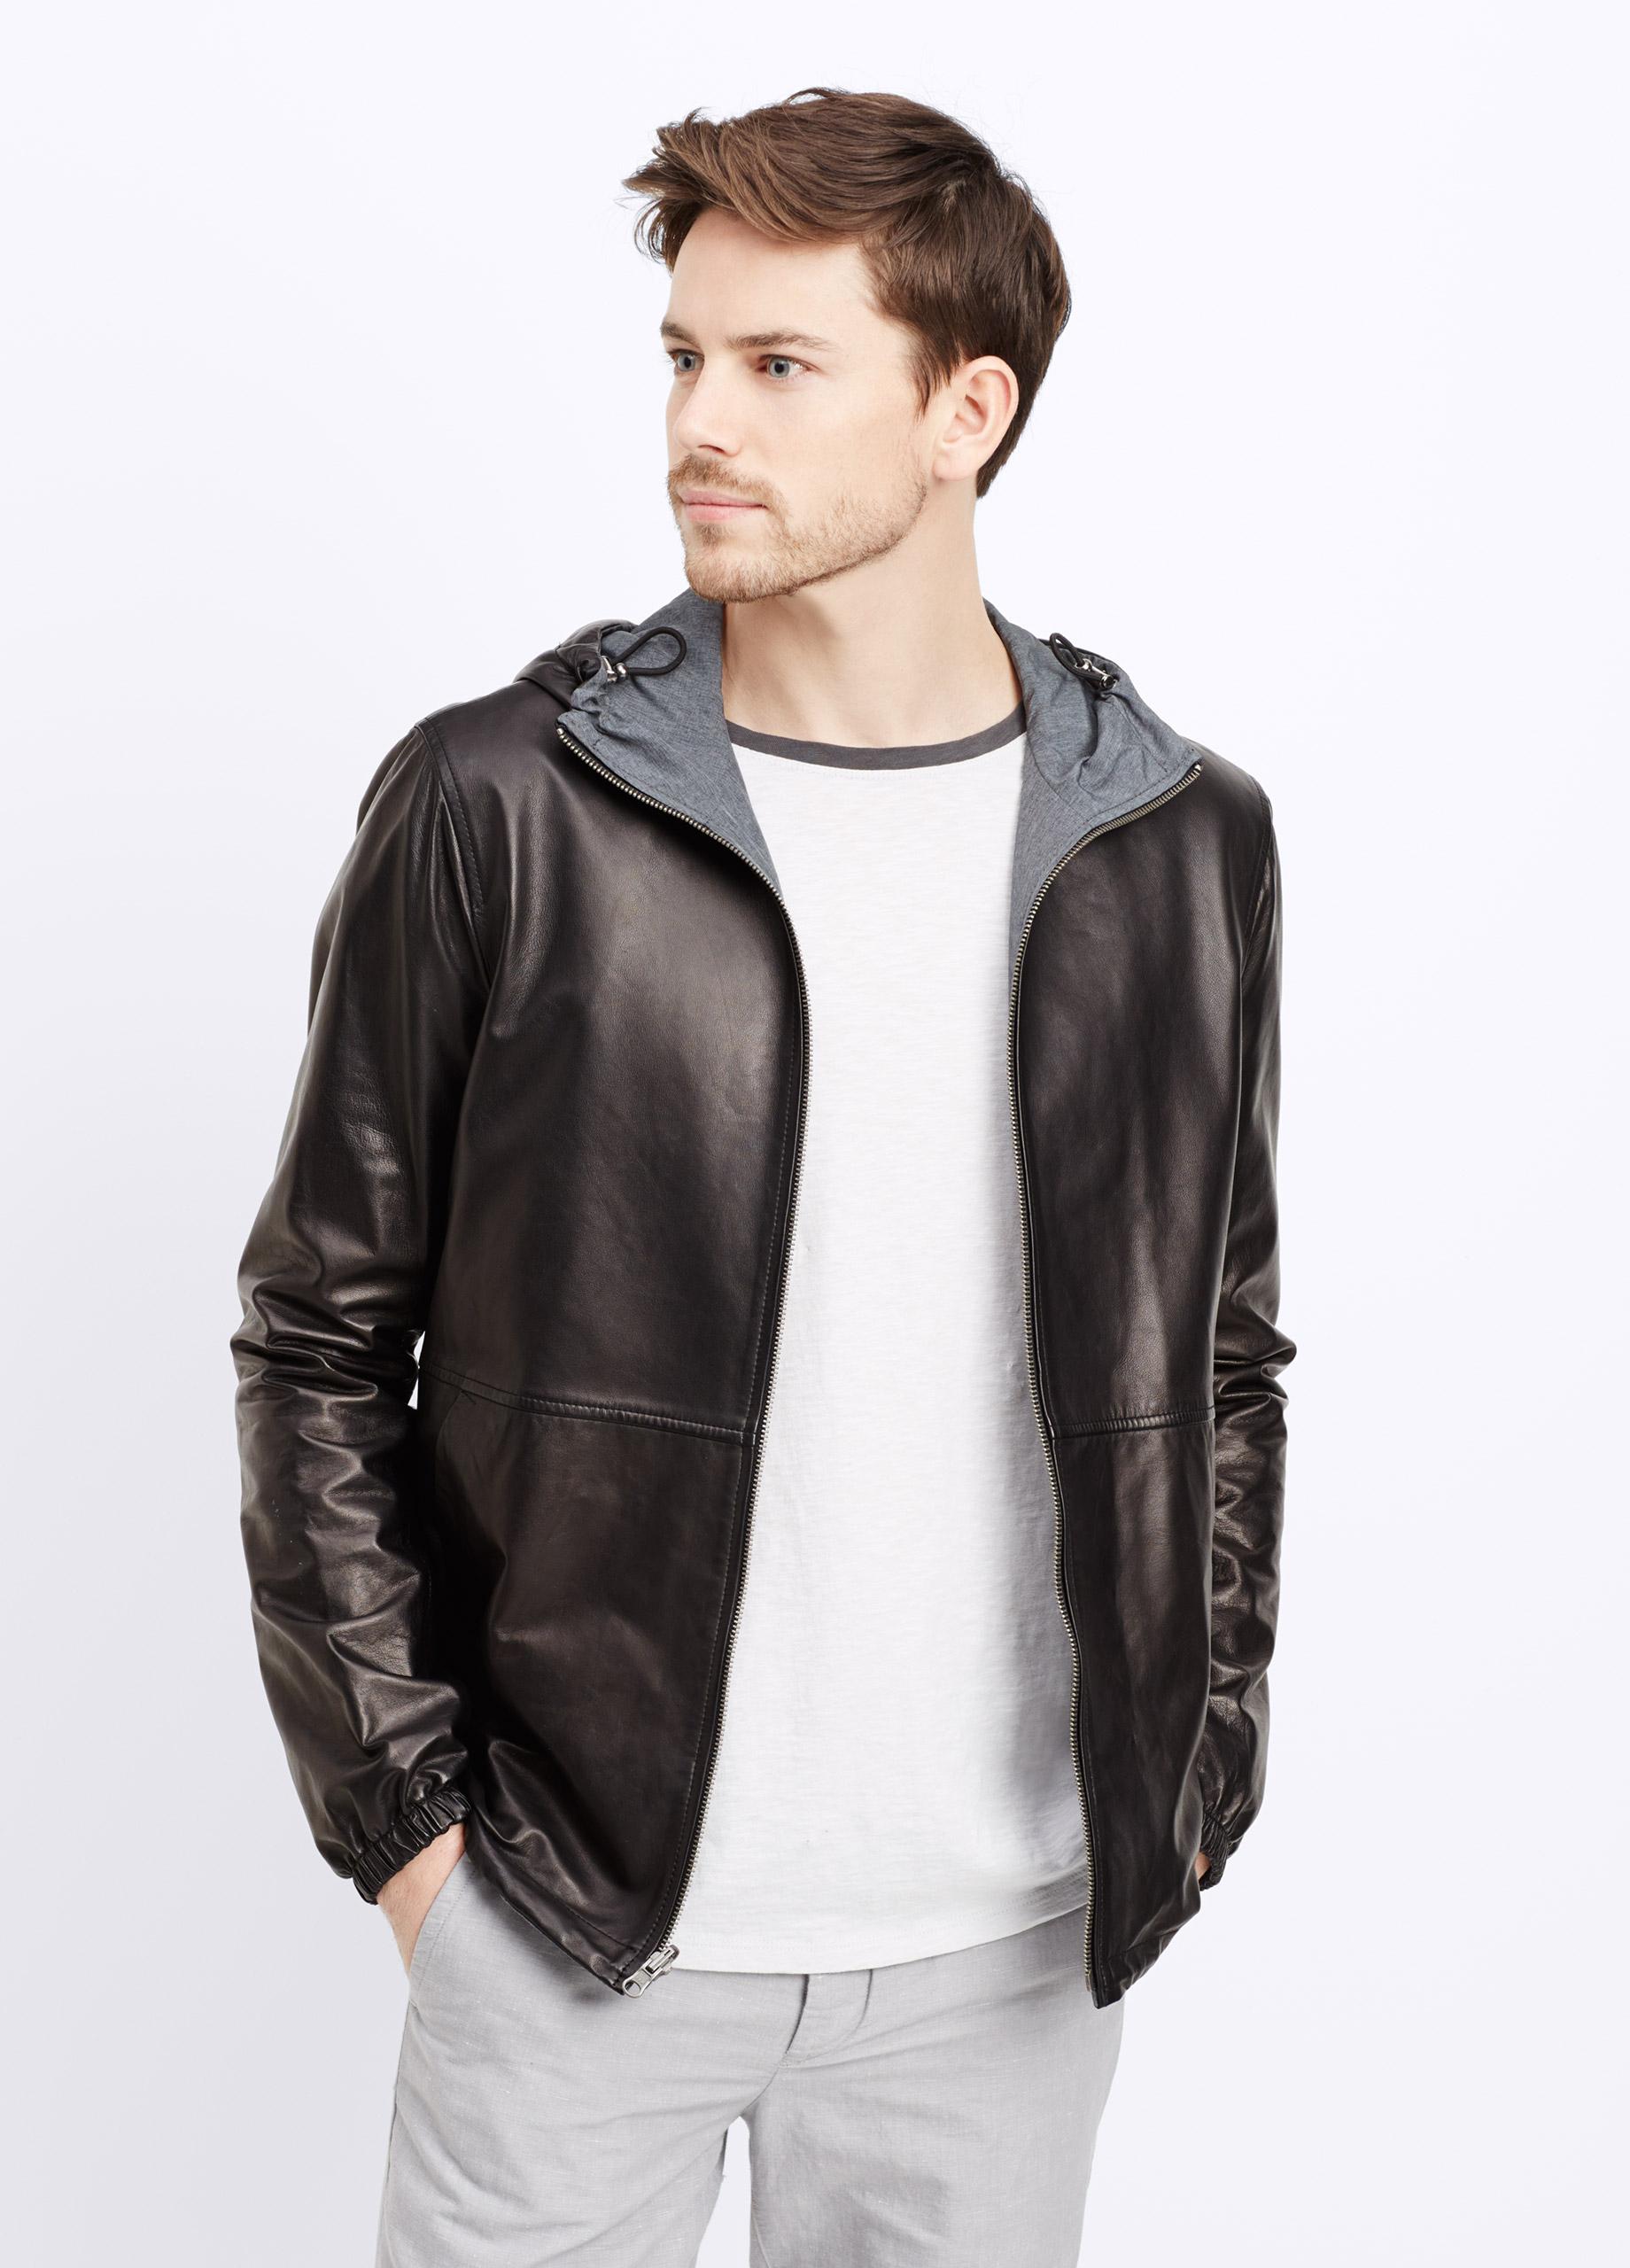 Vince Runa Light Hooded Leather Jacket In Black For Men Lyst